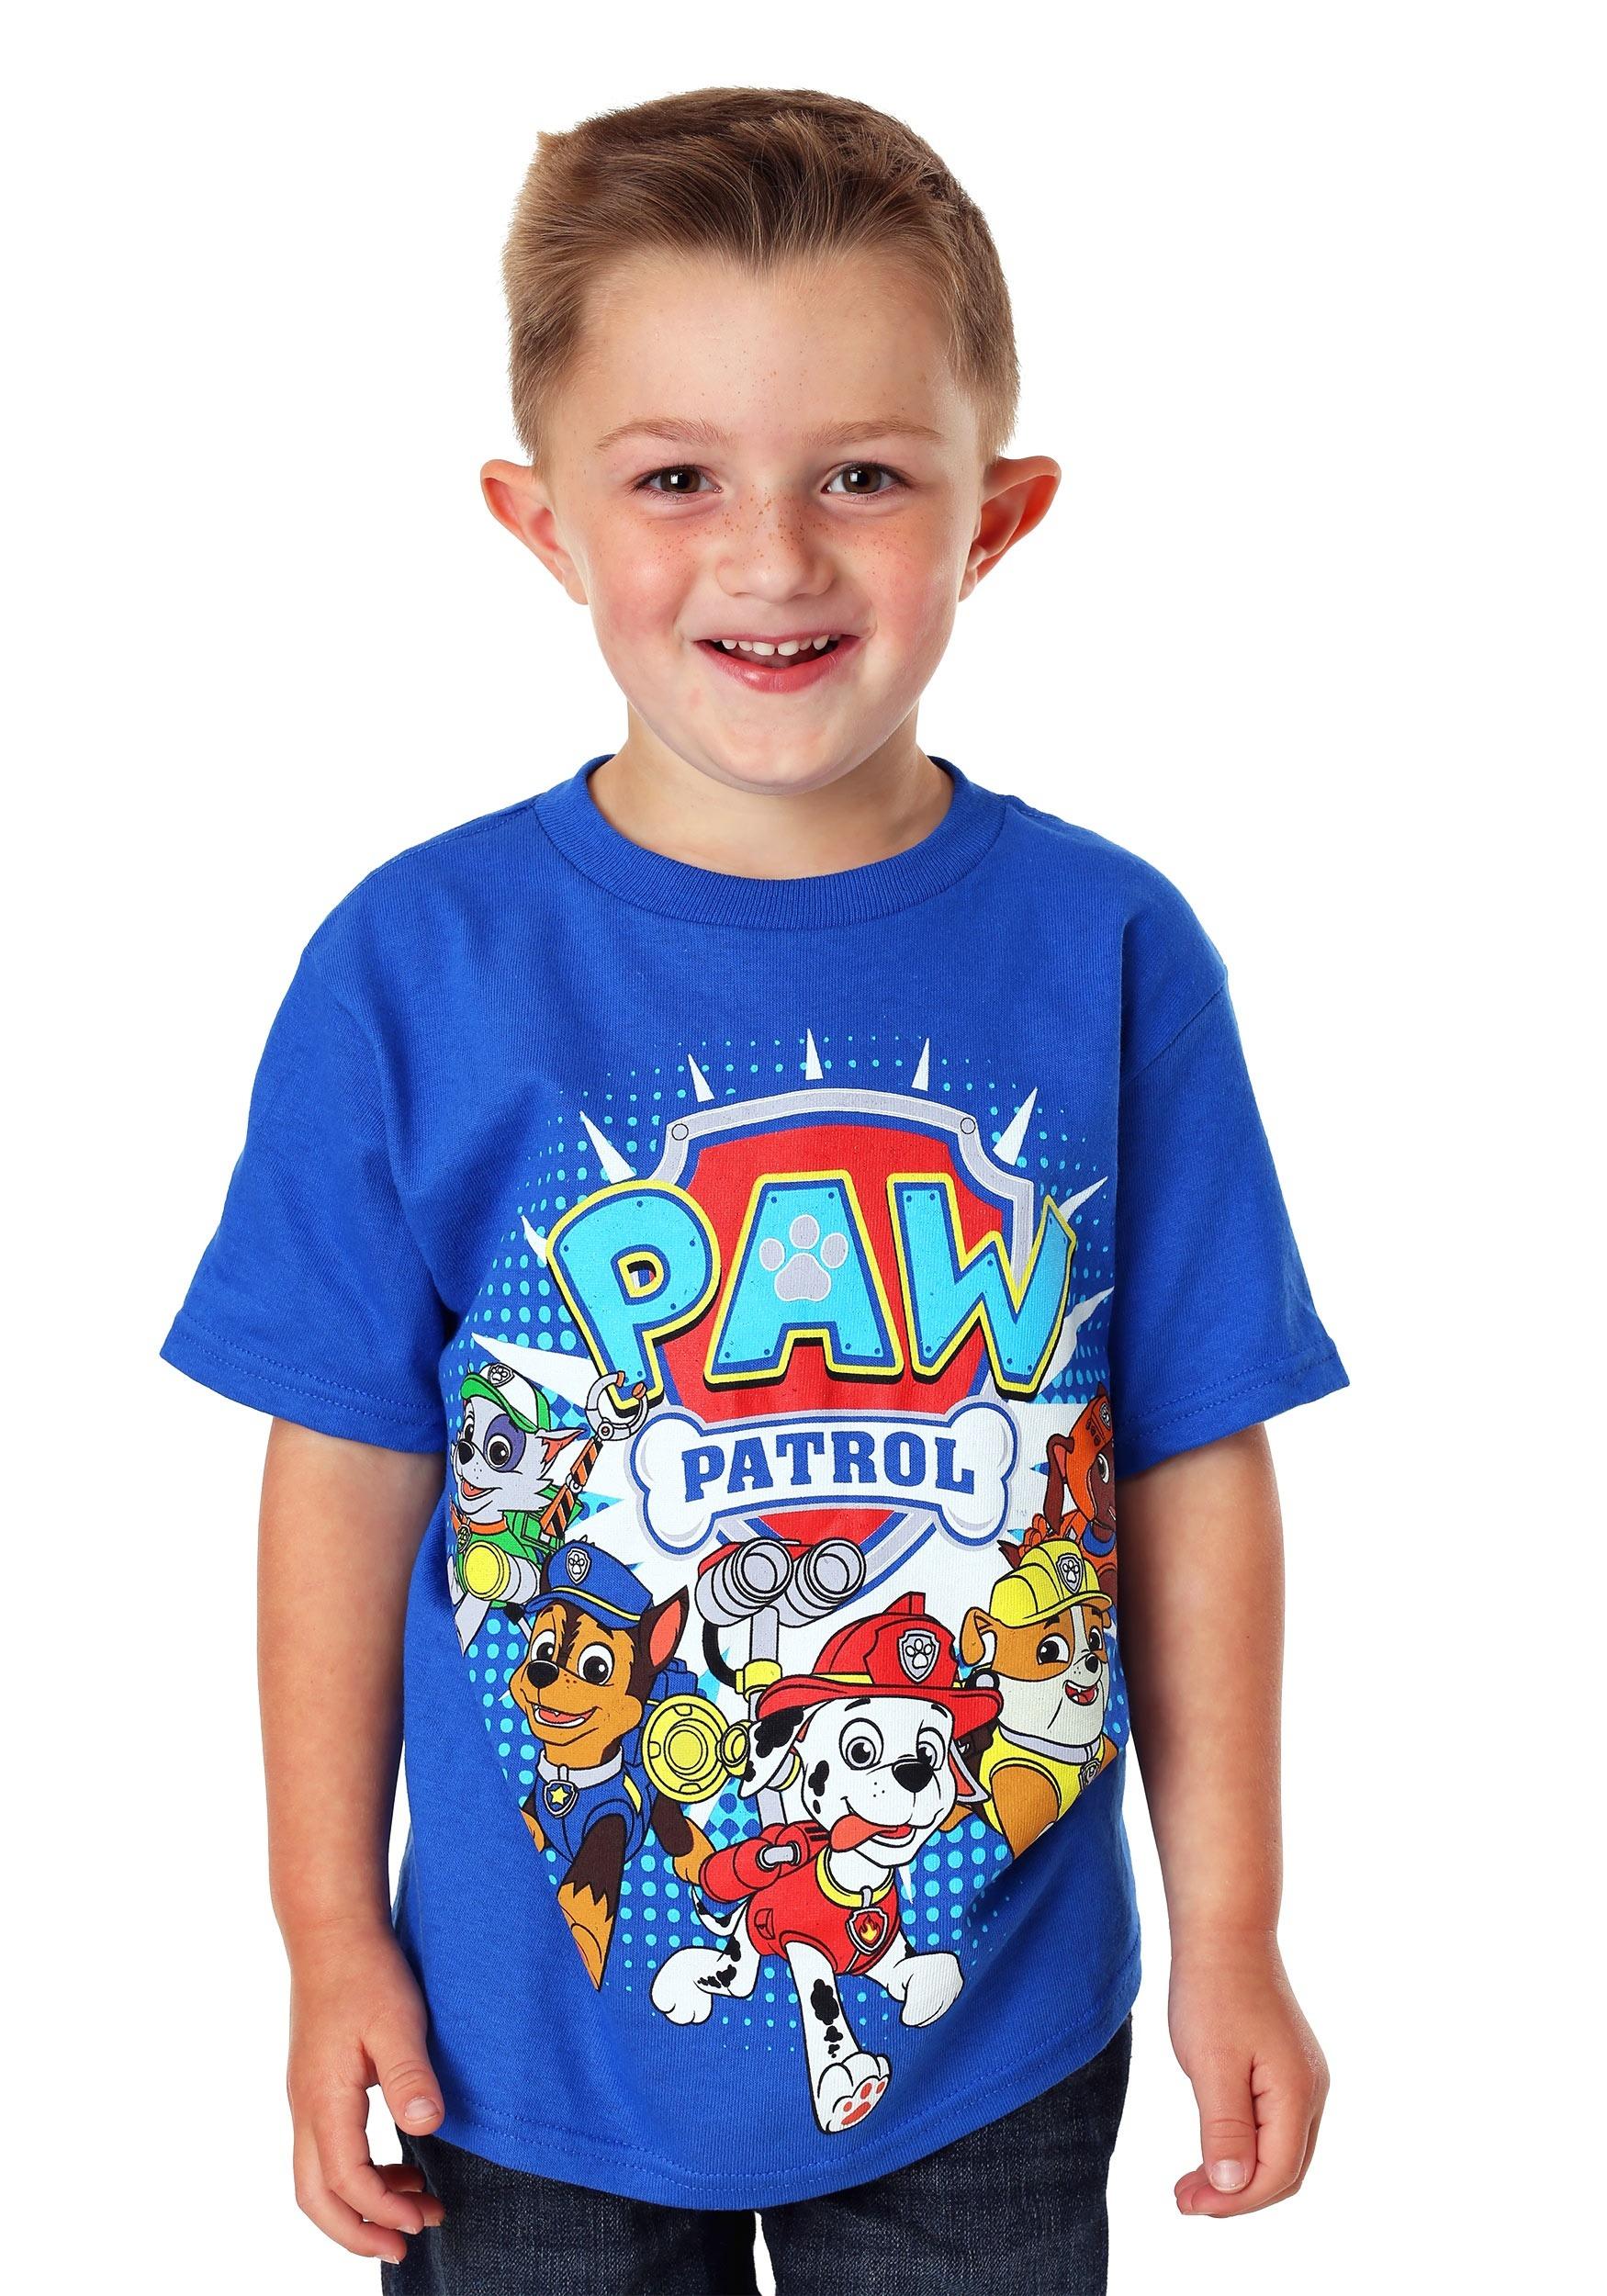 Paw Patrol Group Shot Boy's T-Shirt